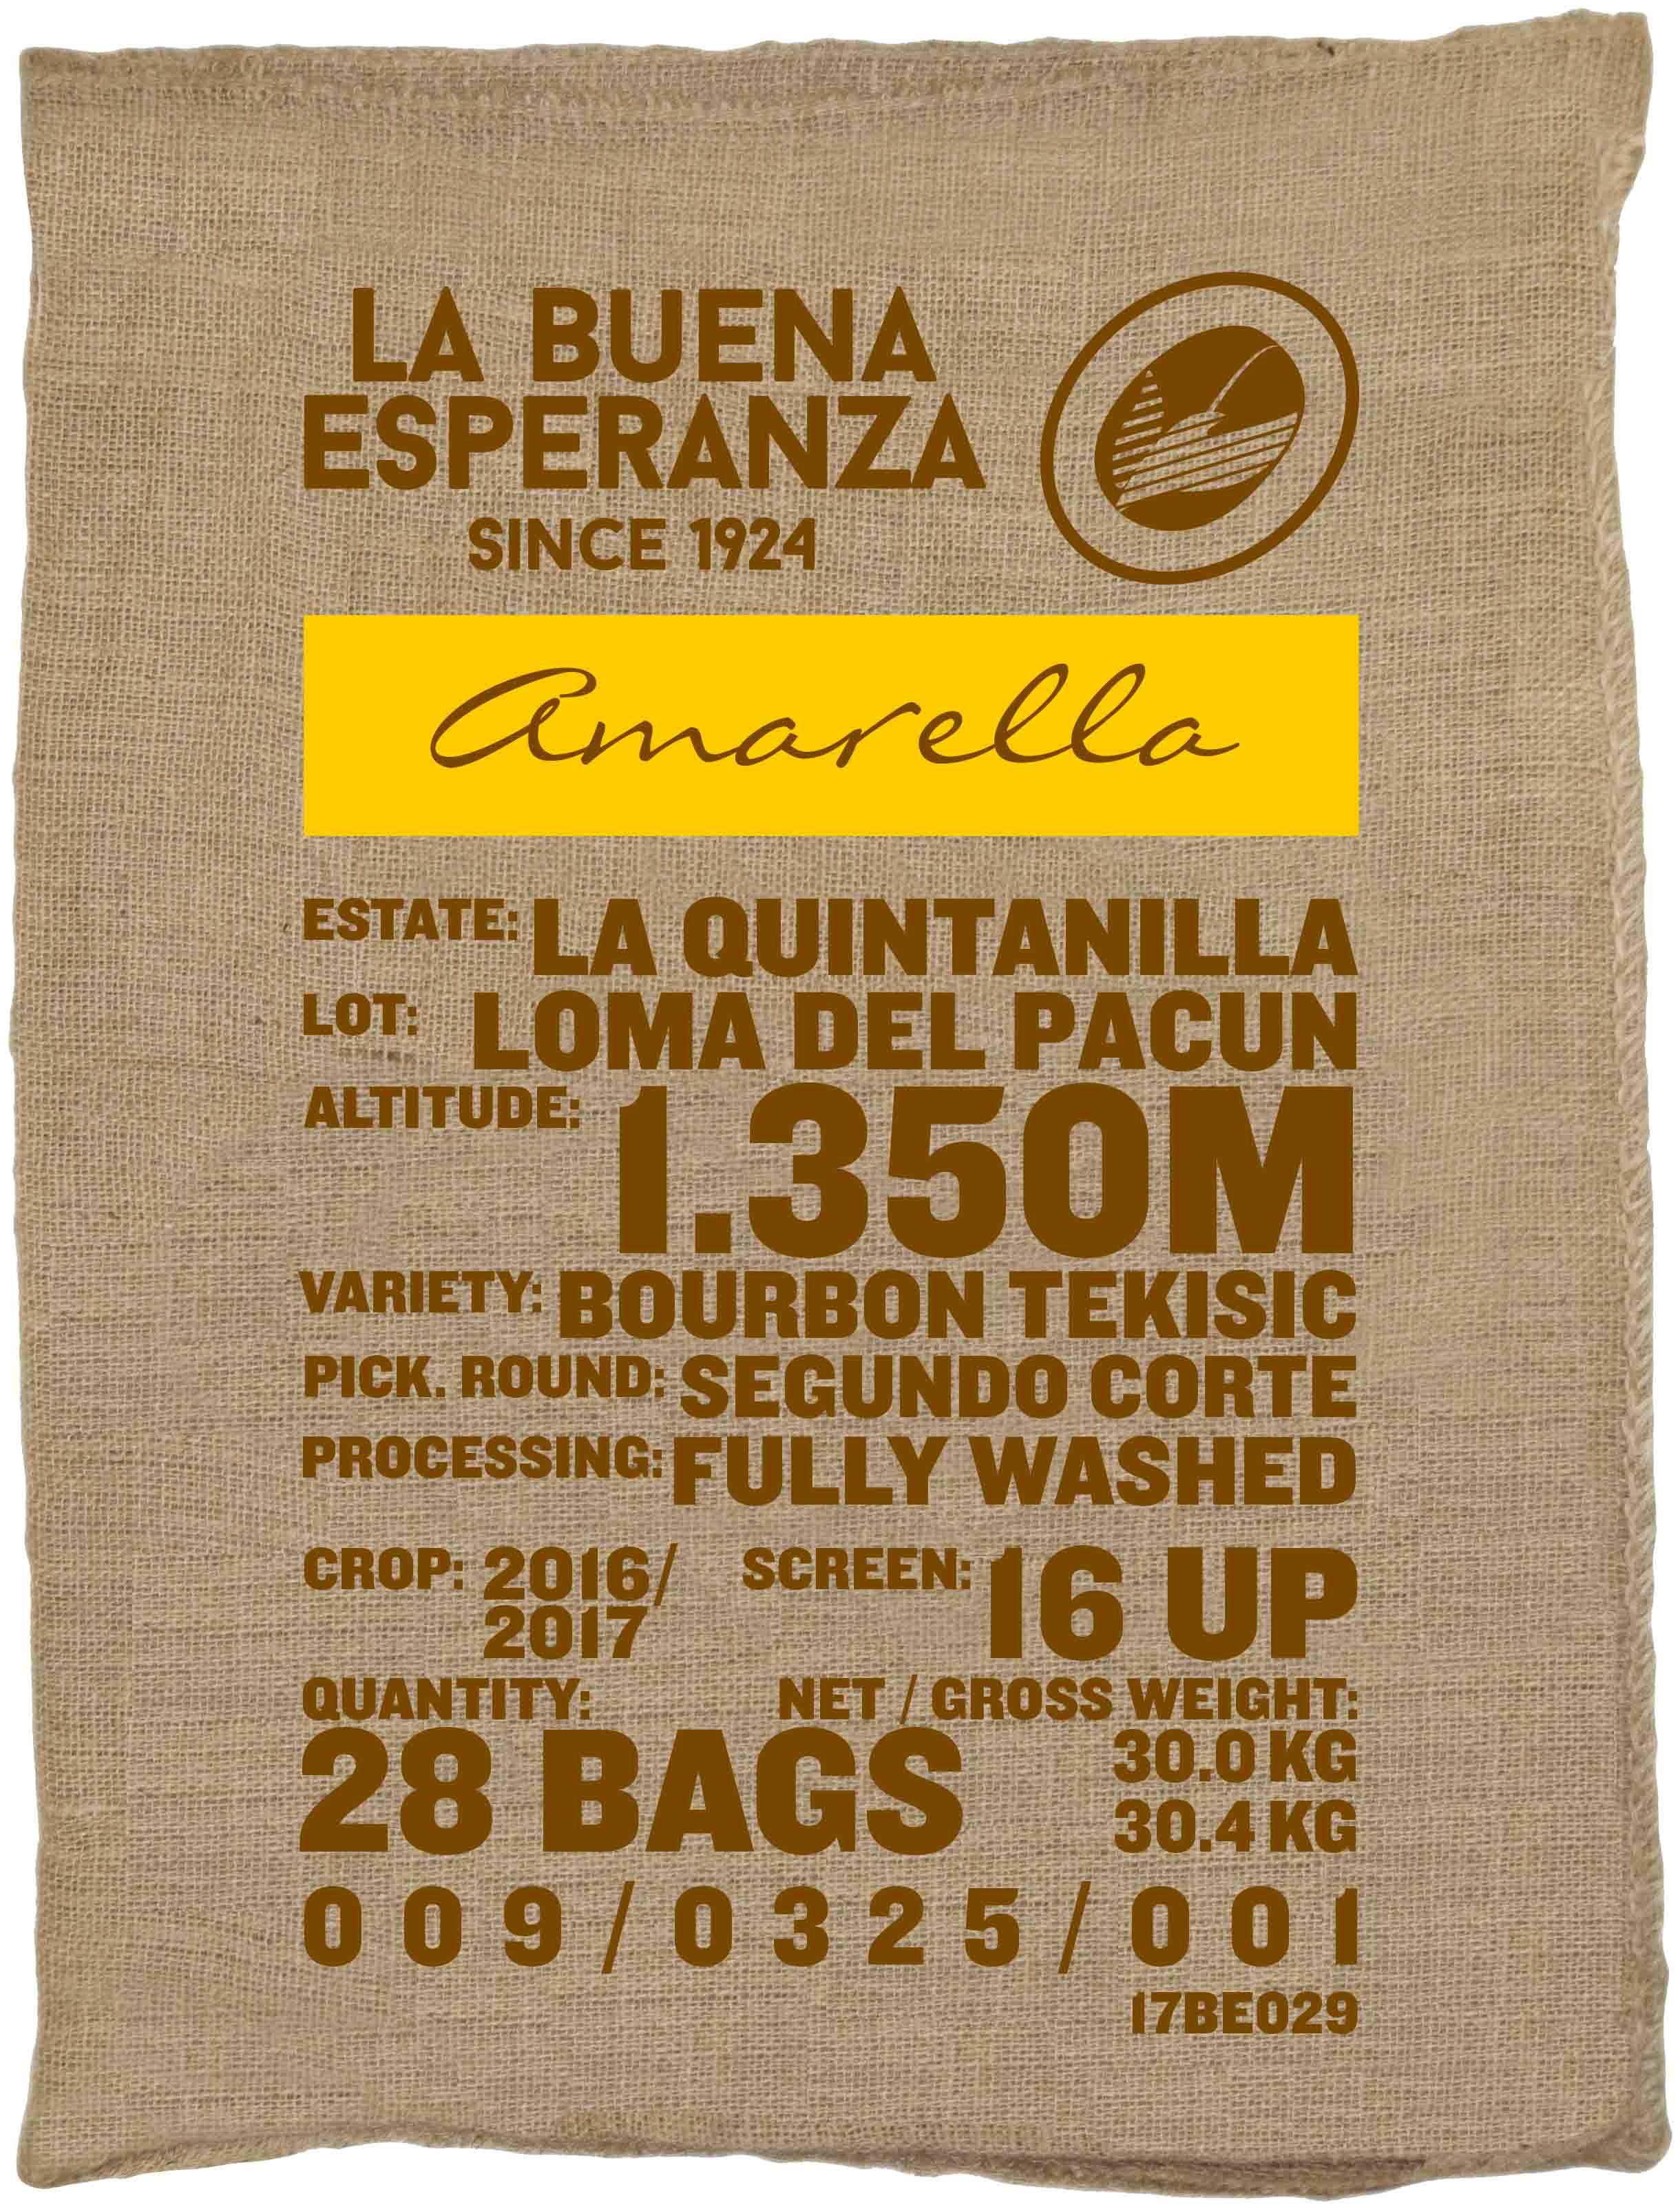 Ein Rohkaffeesack amarella Parzellenkaffee Varietät Bourbon Tekisic. Finca La Buena Esperanza Lot Loma del Pacun.